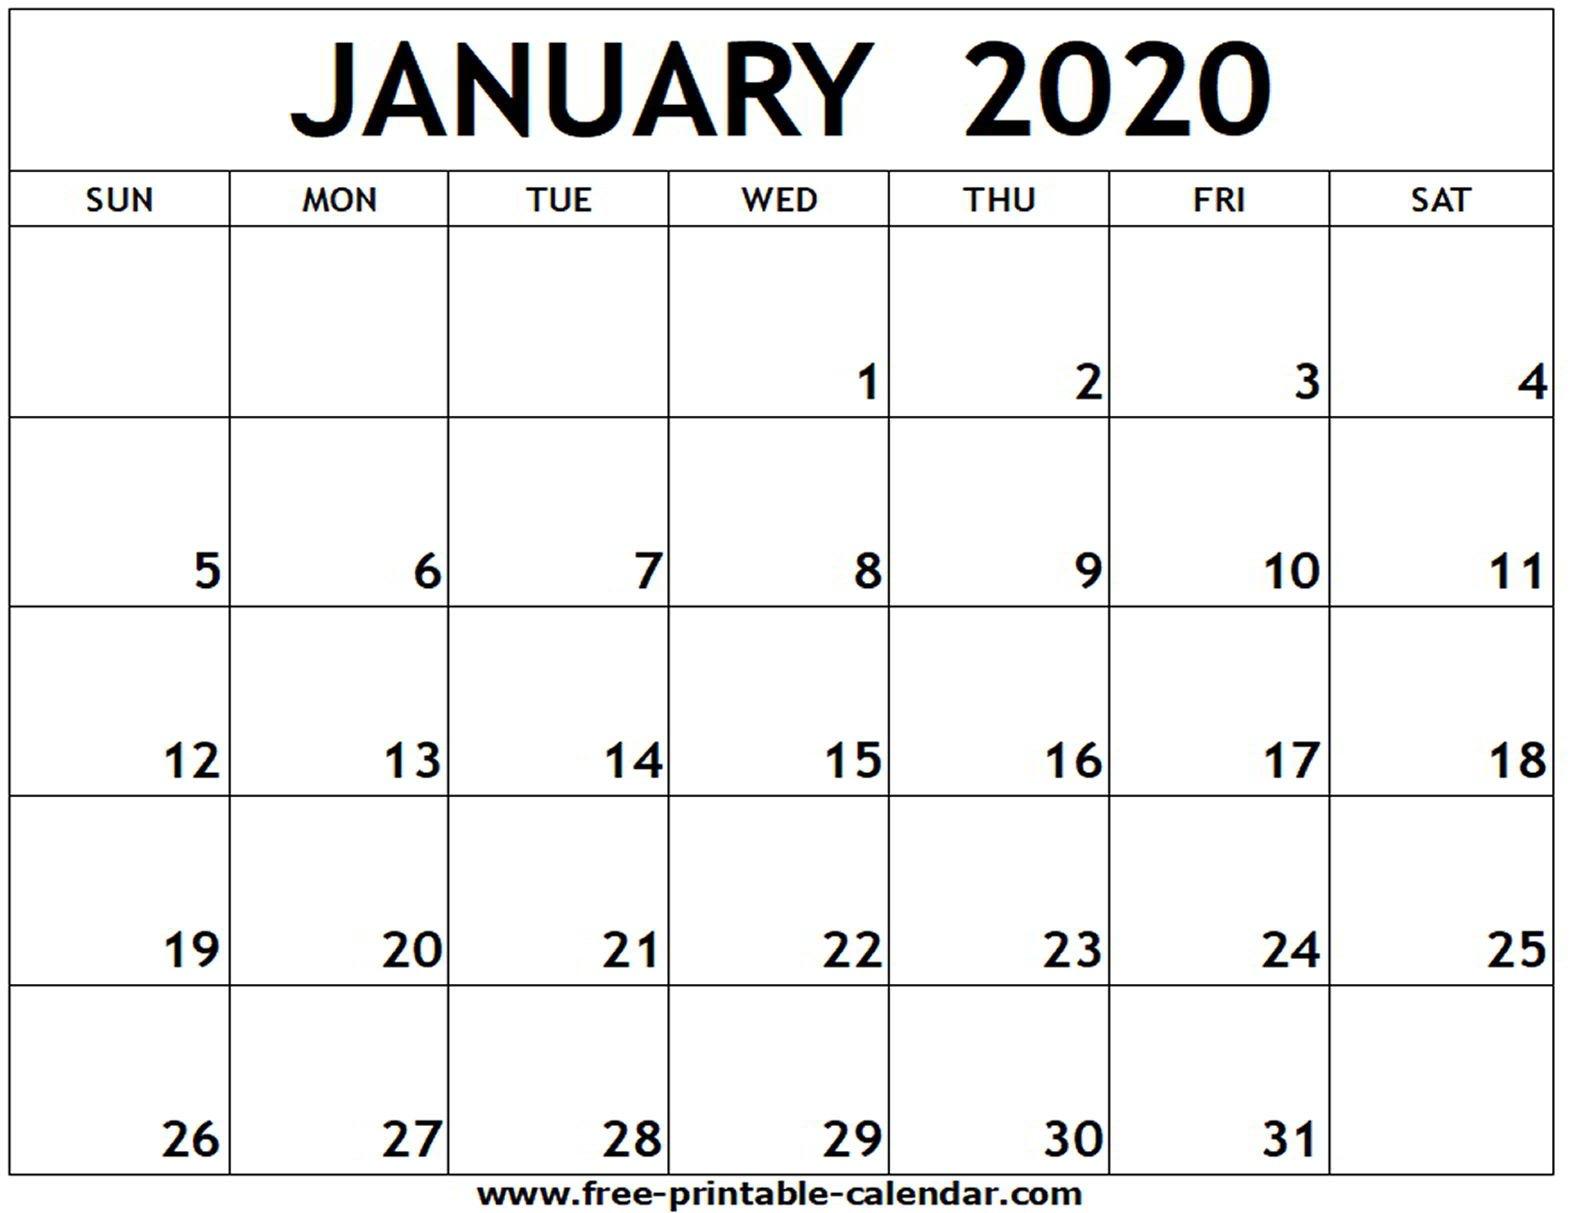 January 2020 Printable Calendar – Free Printable Calendar Free Fill In Calendar